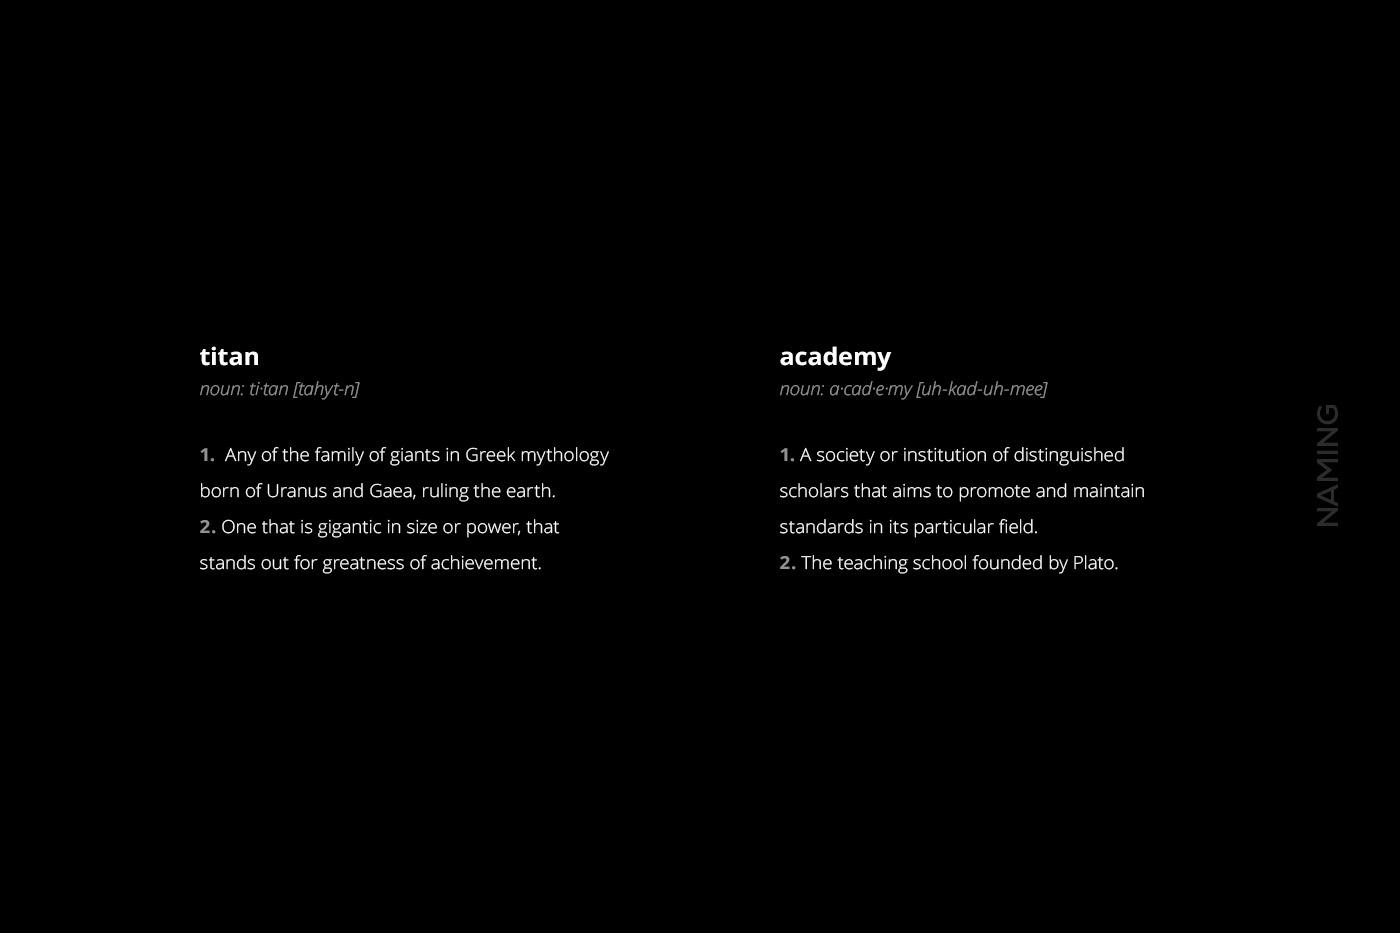 titan-academy-case-study-002.1.jpg